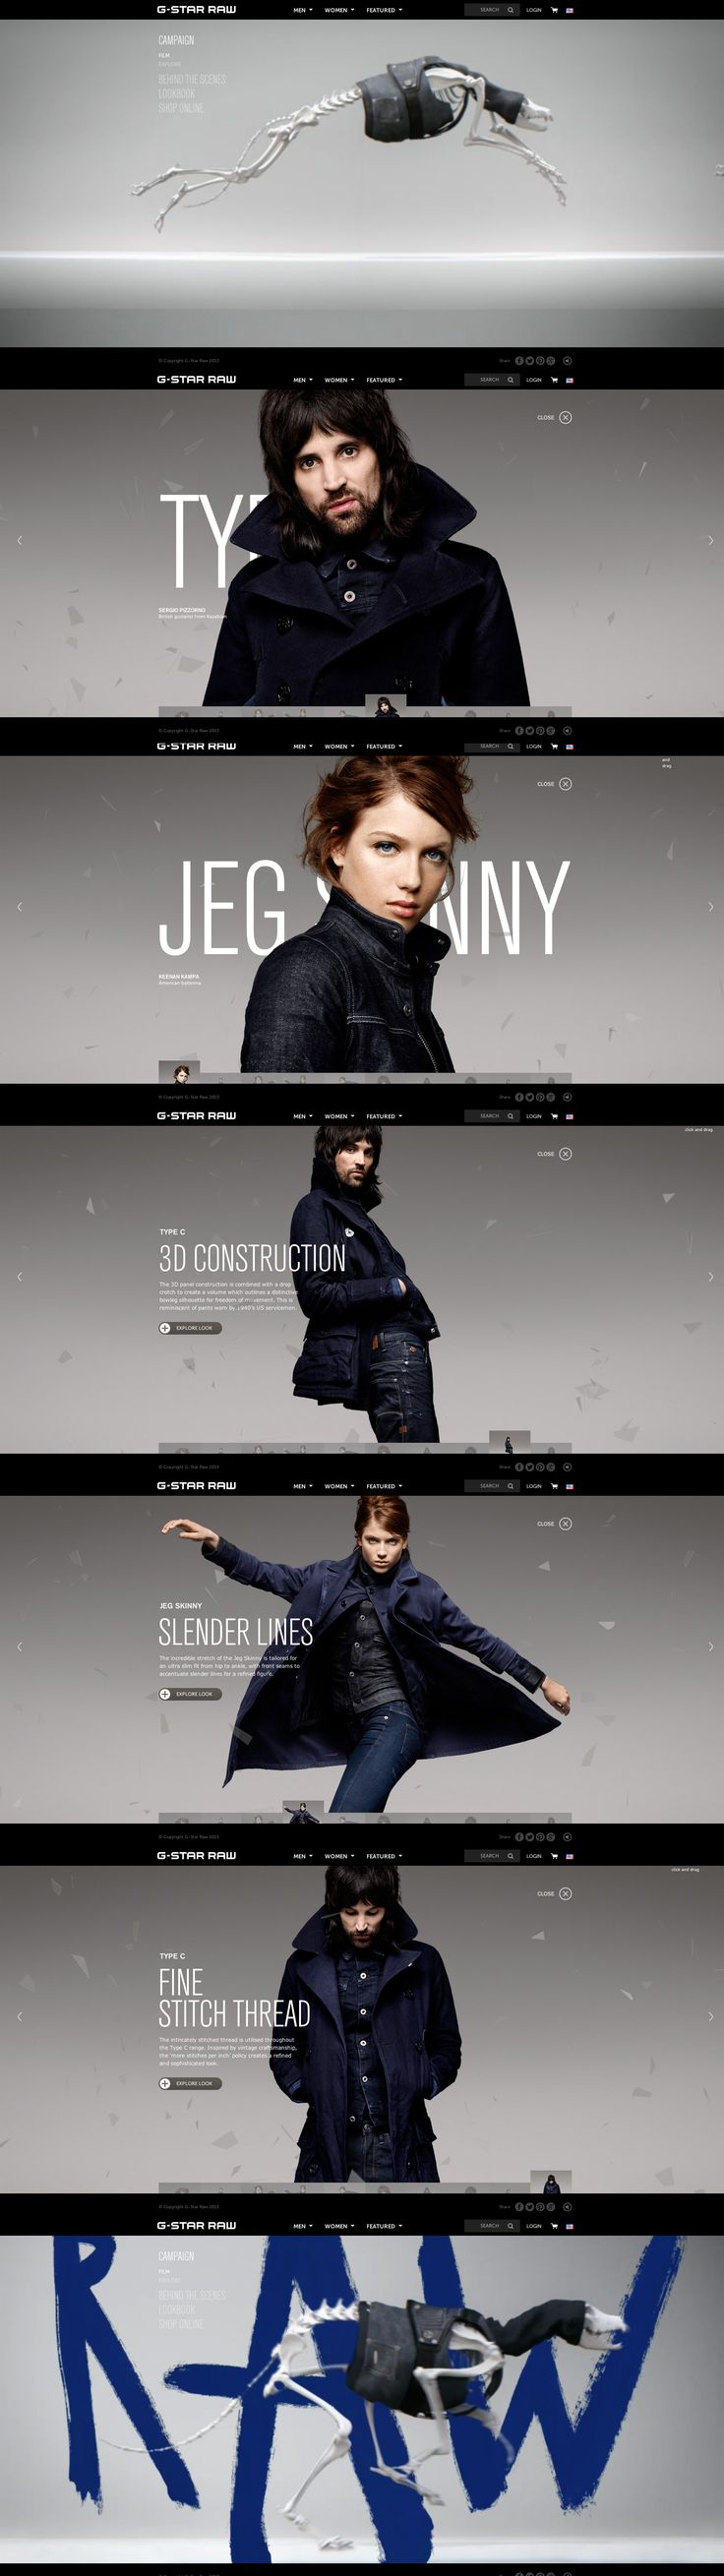 G-Star RAW, 17 September 2013. http://www.awwwards.com/web-design-awards/g-star-raw  #Fashion #Minimal #Flexible #CSS3 #HTML5 #Photography #FlatDesign